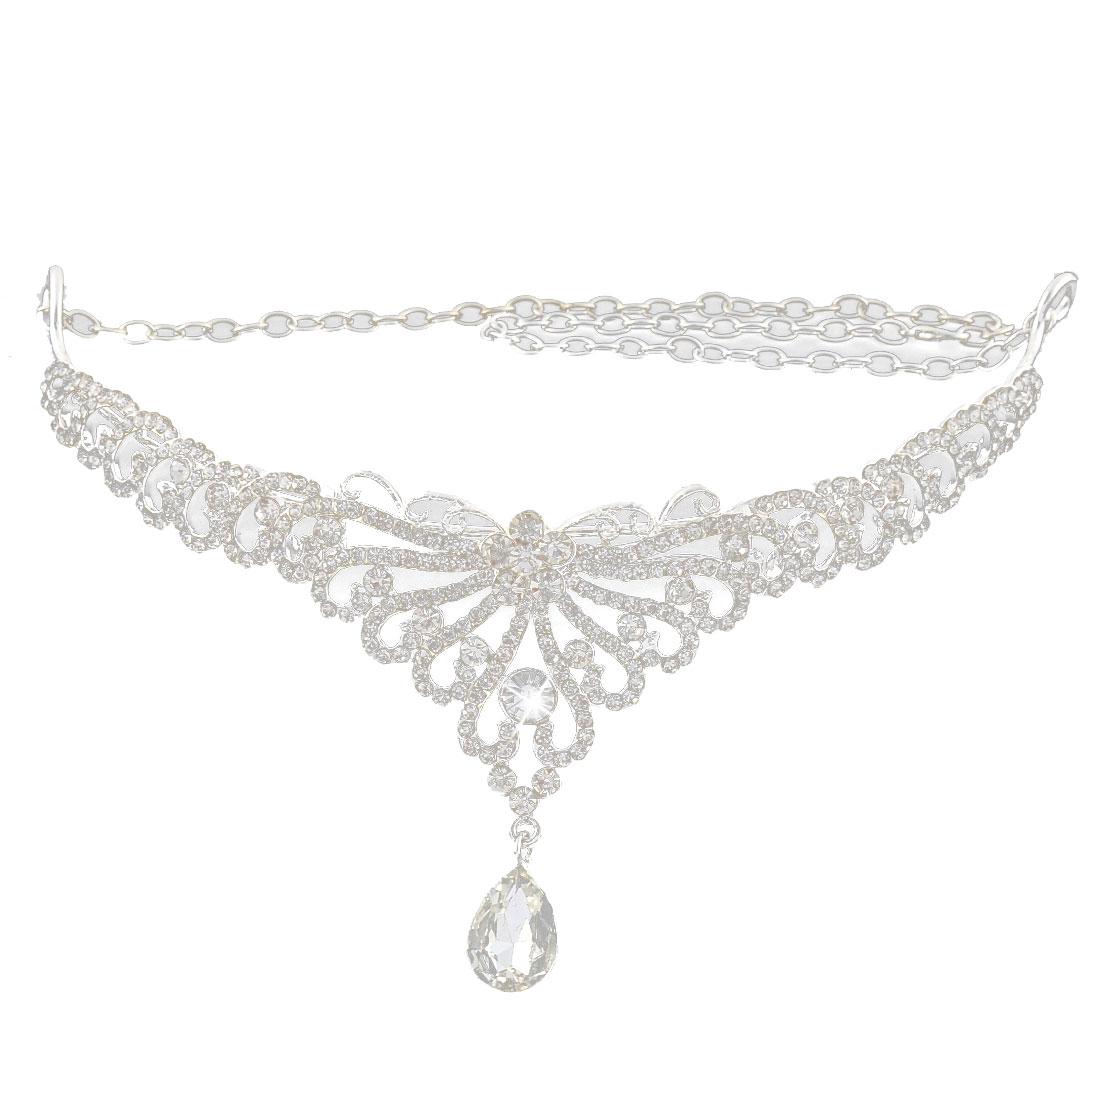 Wedding Bride Rhinestone Droplets Diadem Crown Headpiece Frontlet Silver Tone